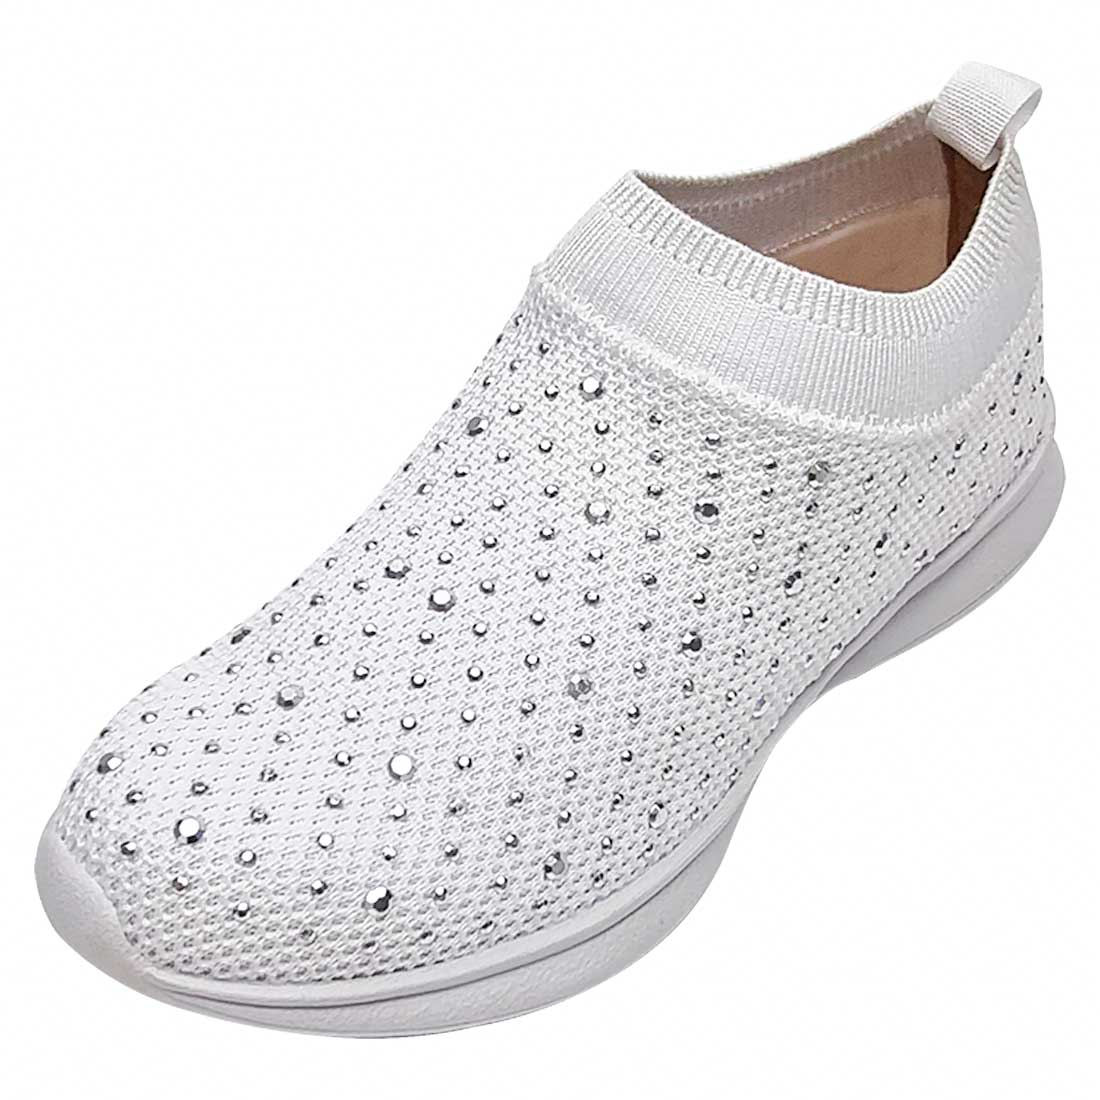 Tênis Meia Comfort com Hotfix - Branco